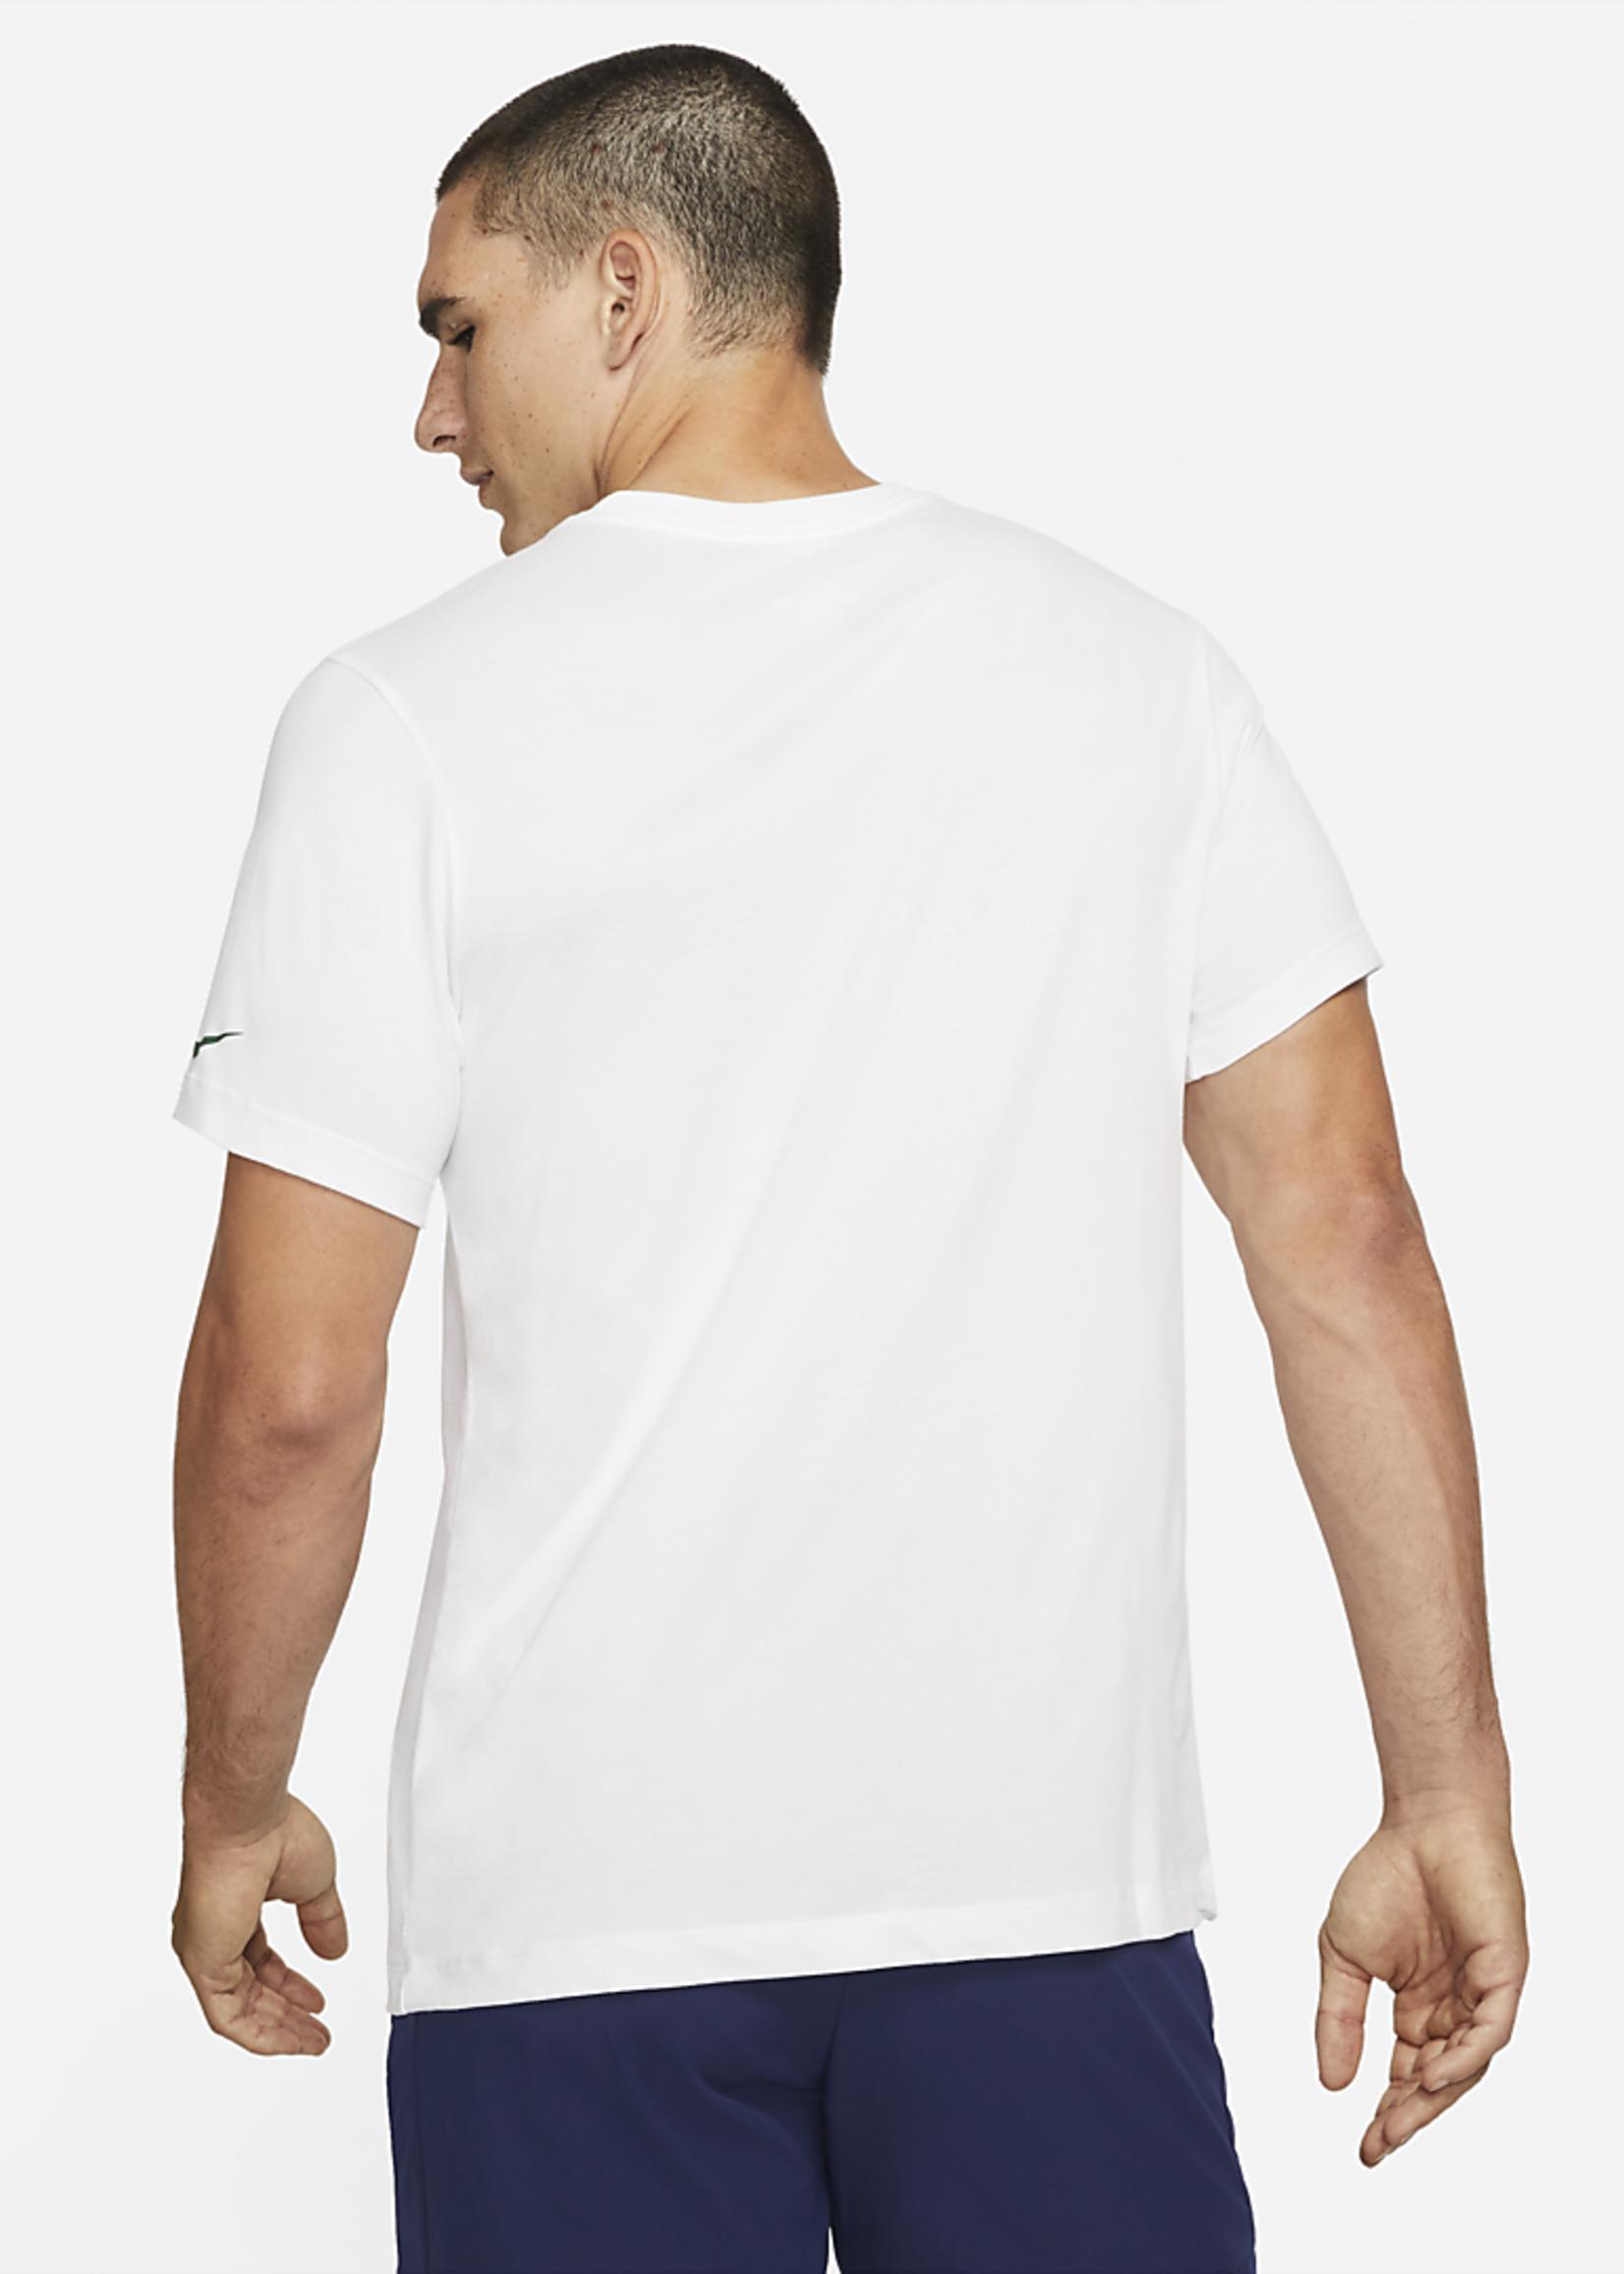 Nike MEN'S NIKECOURT DRI-FIT RAFA DJ2582